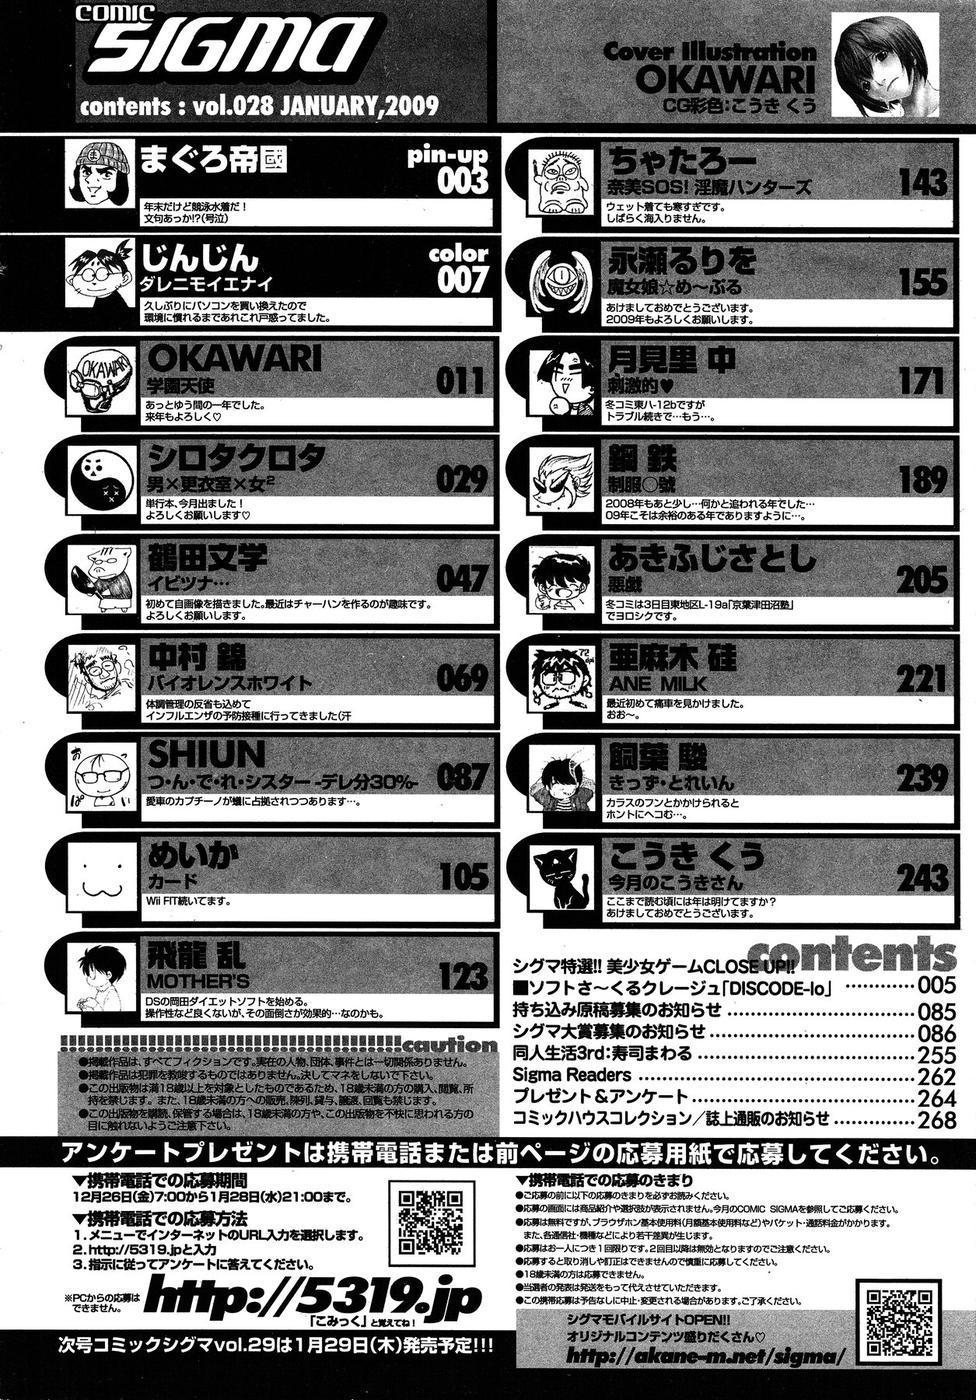 COMIC SIGMA 2009-01 Vol.28 151